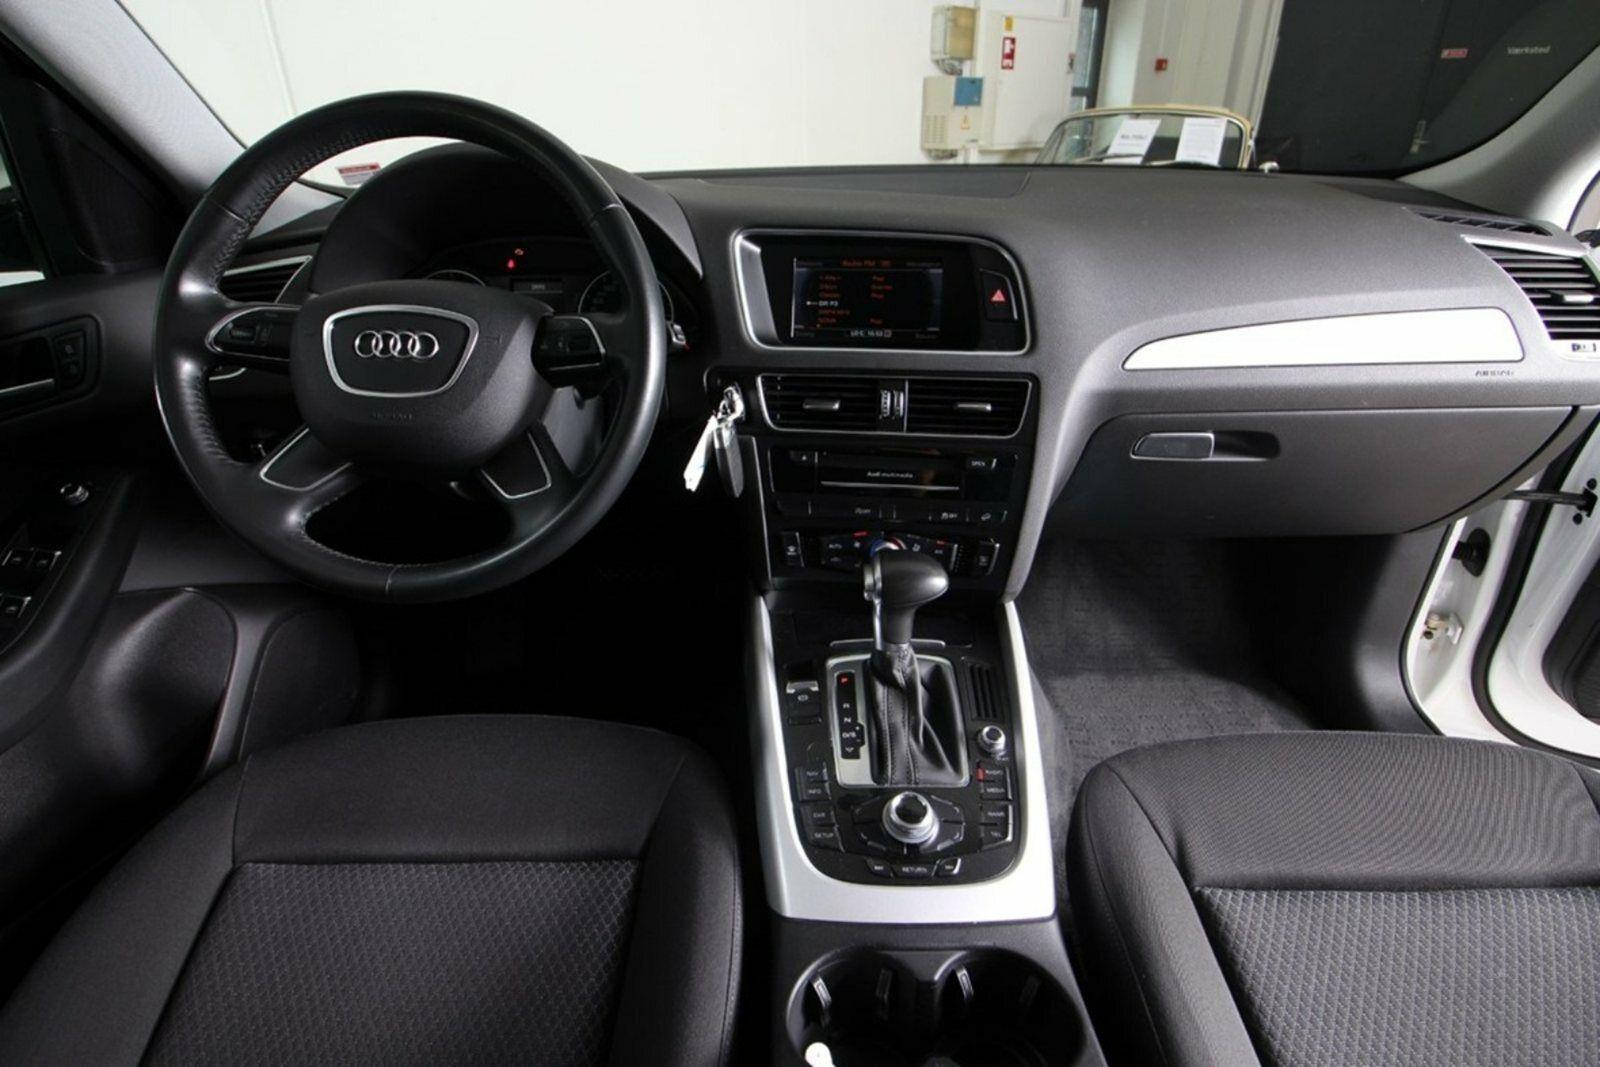 Audi Q5 TDi 190 S-tr. Van